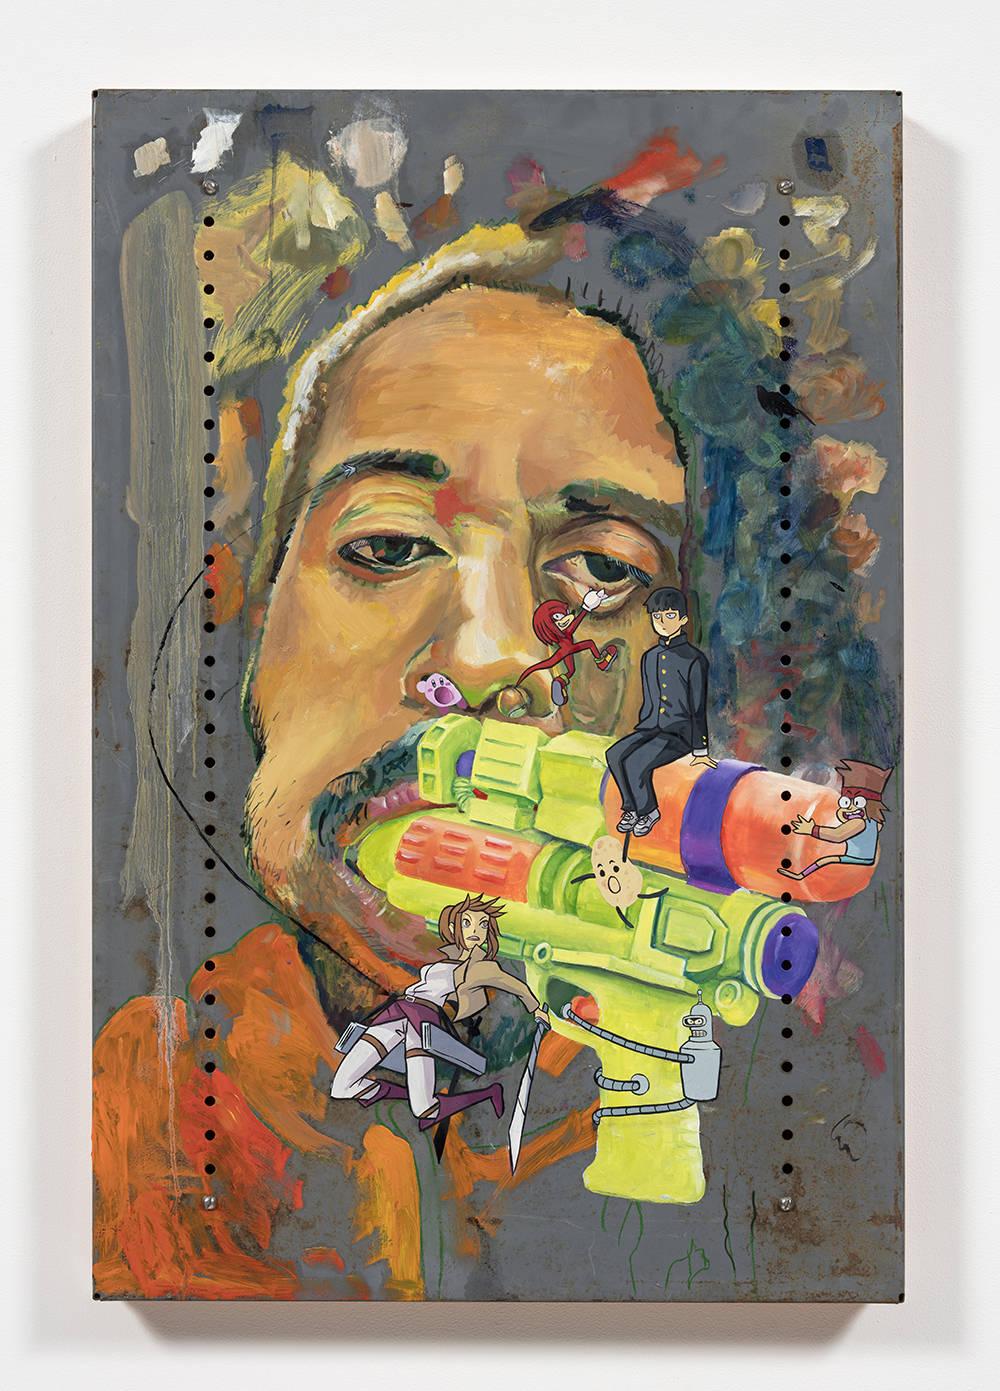 Untitled Self-Portrait (sasha, knuckles shigeo, kirby, samus, ko, idaho and bender)